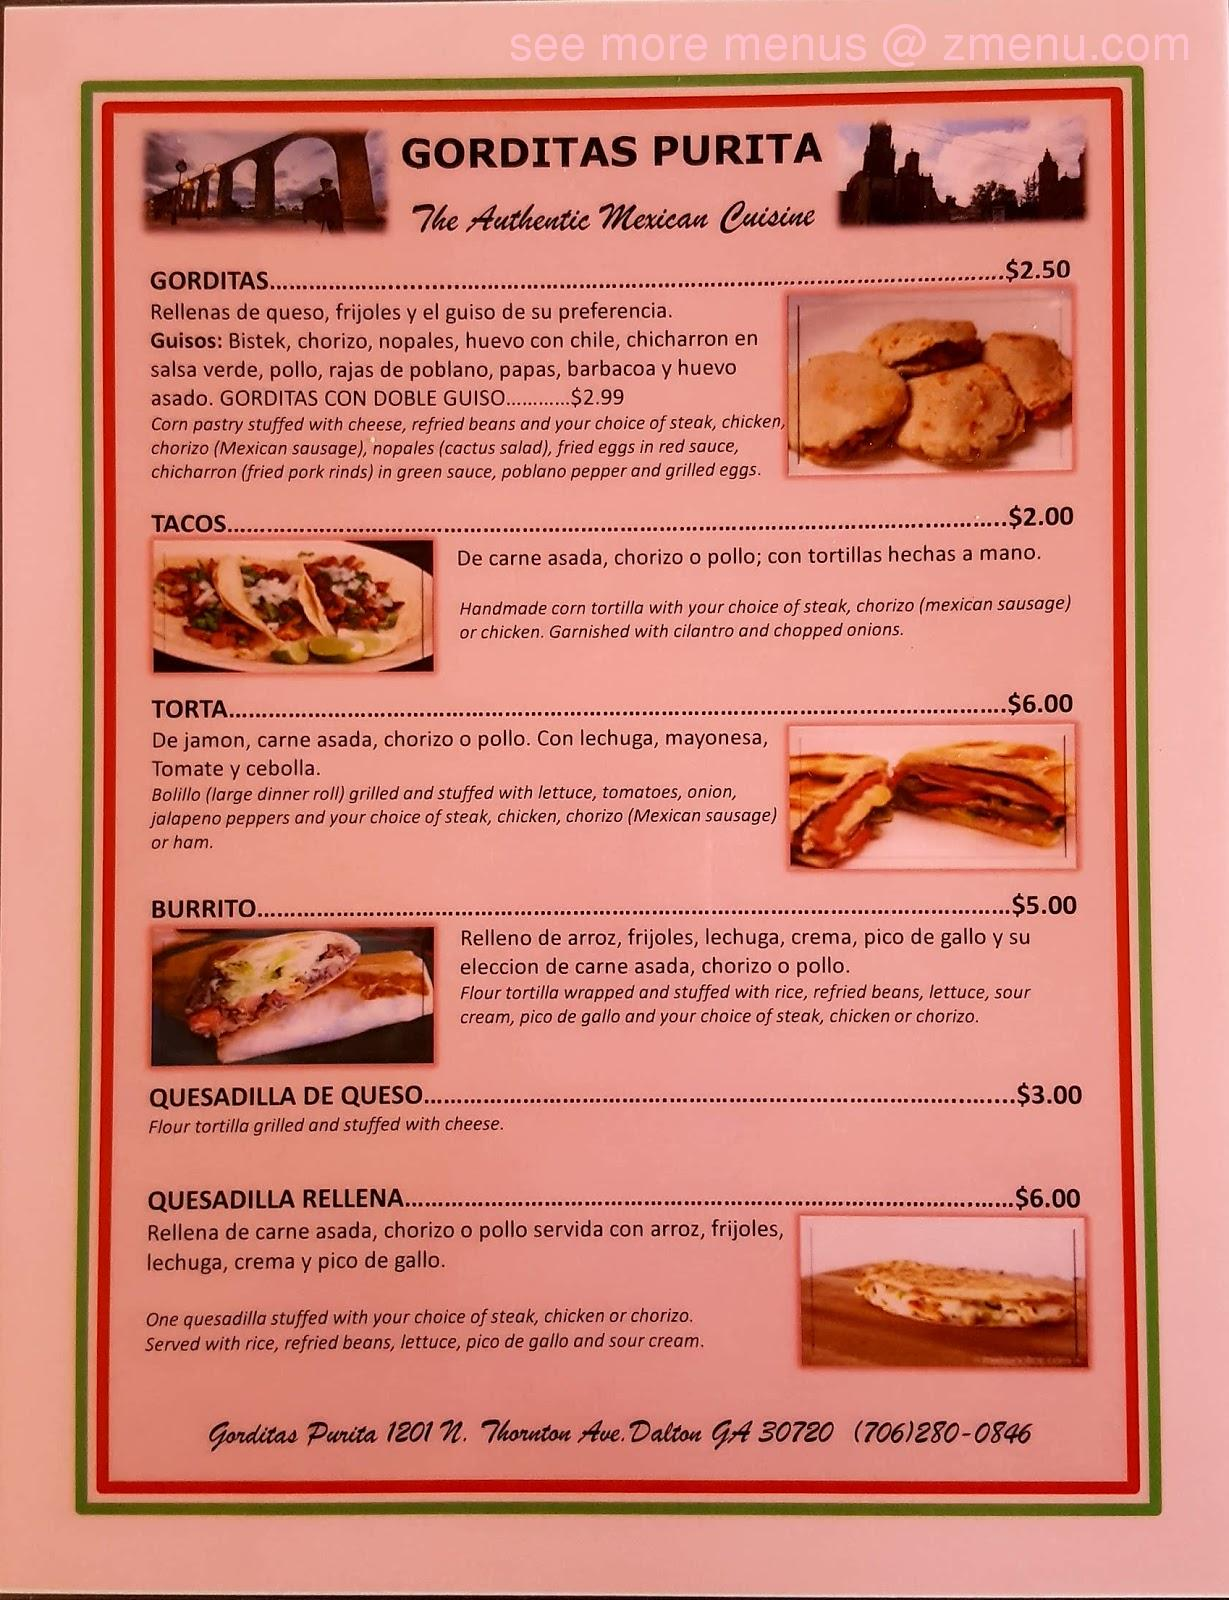 Online Menu of Gorditas Purita Restaurant, Dalton, Georgia